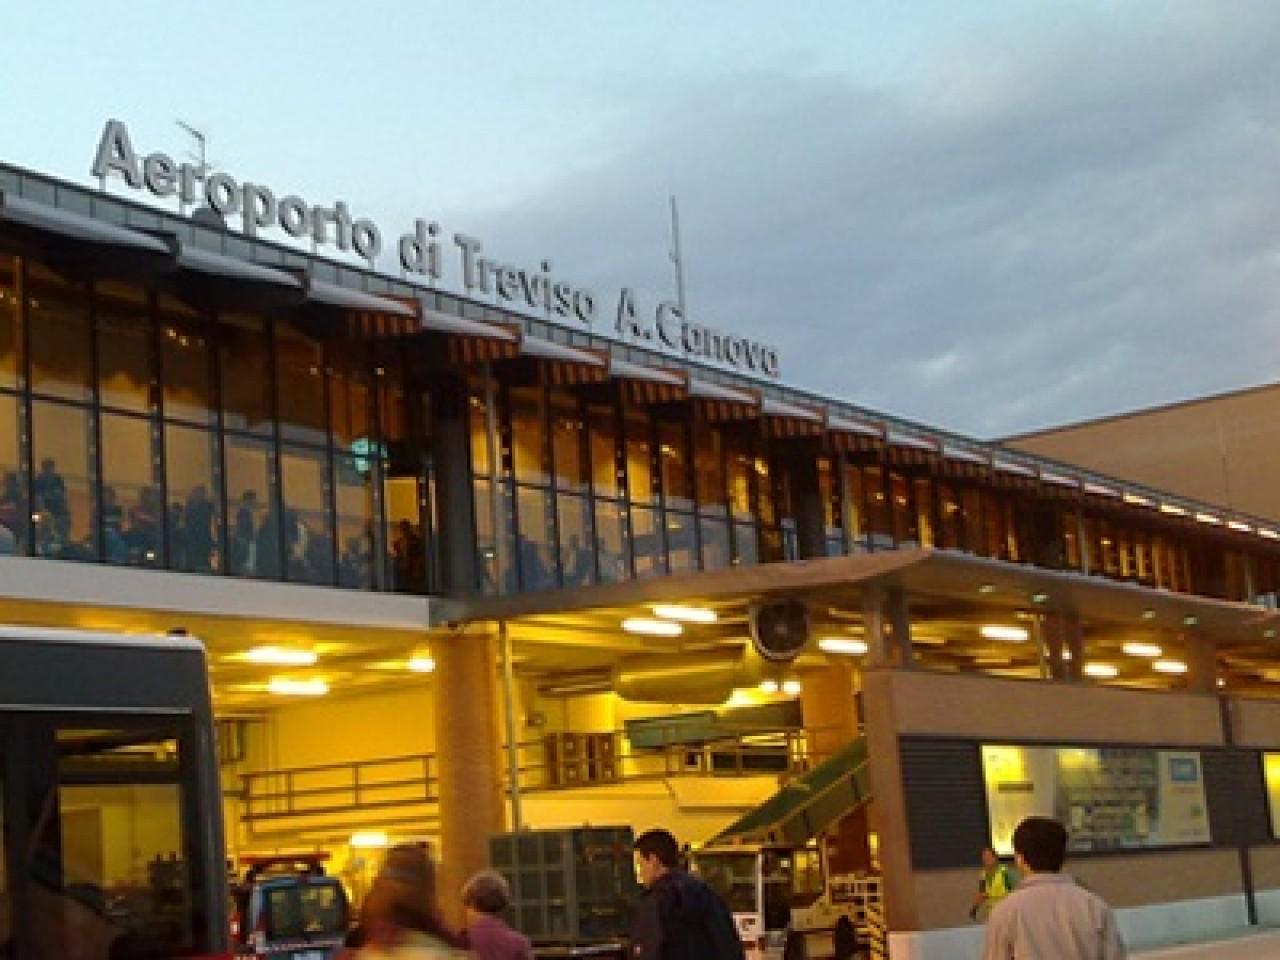 Treviso Airport